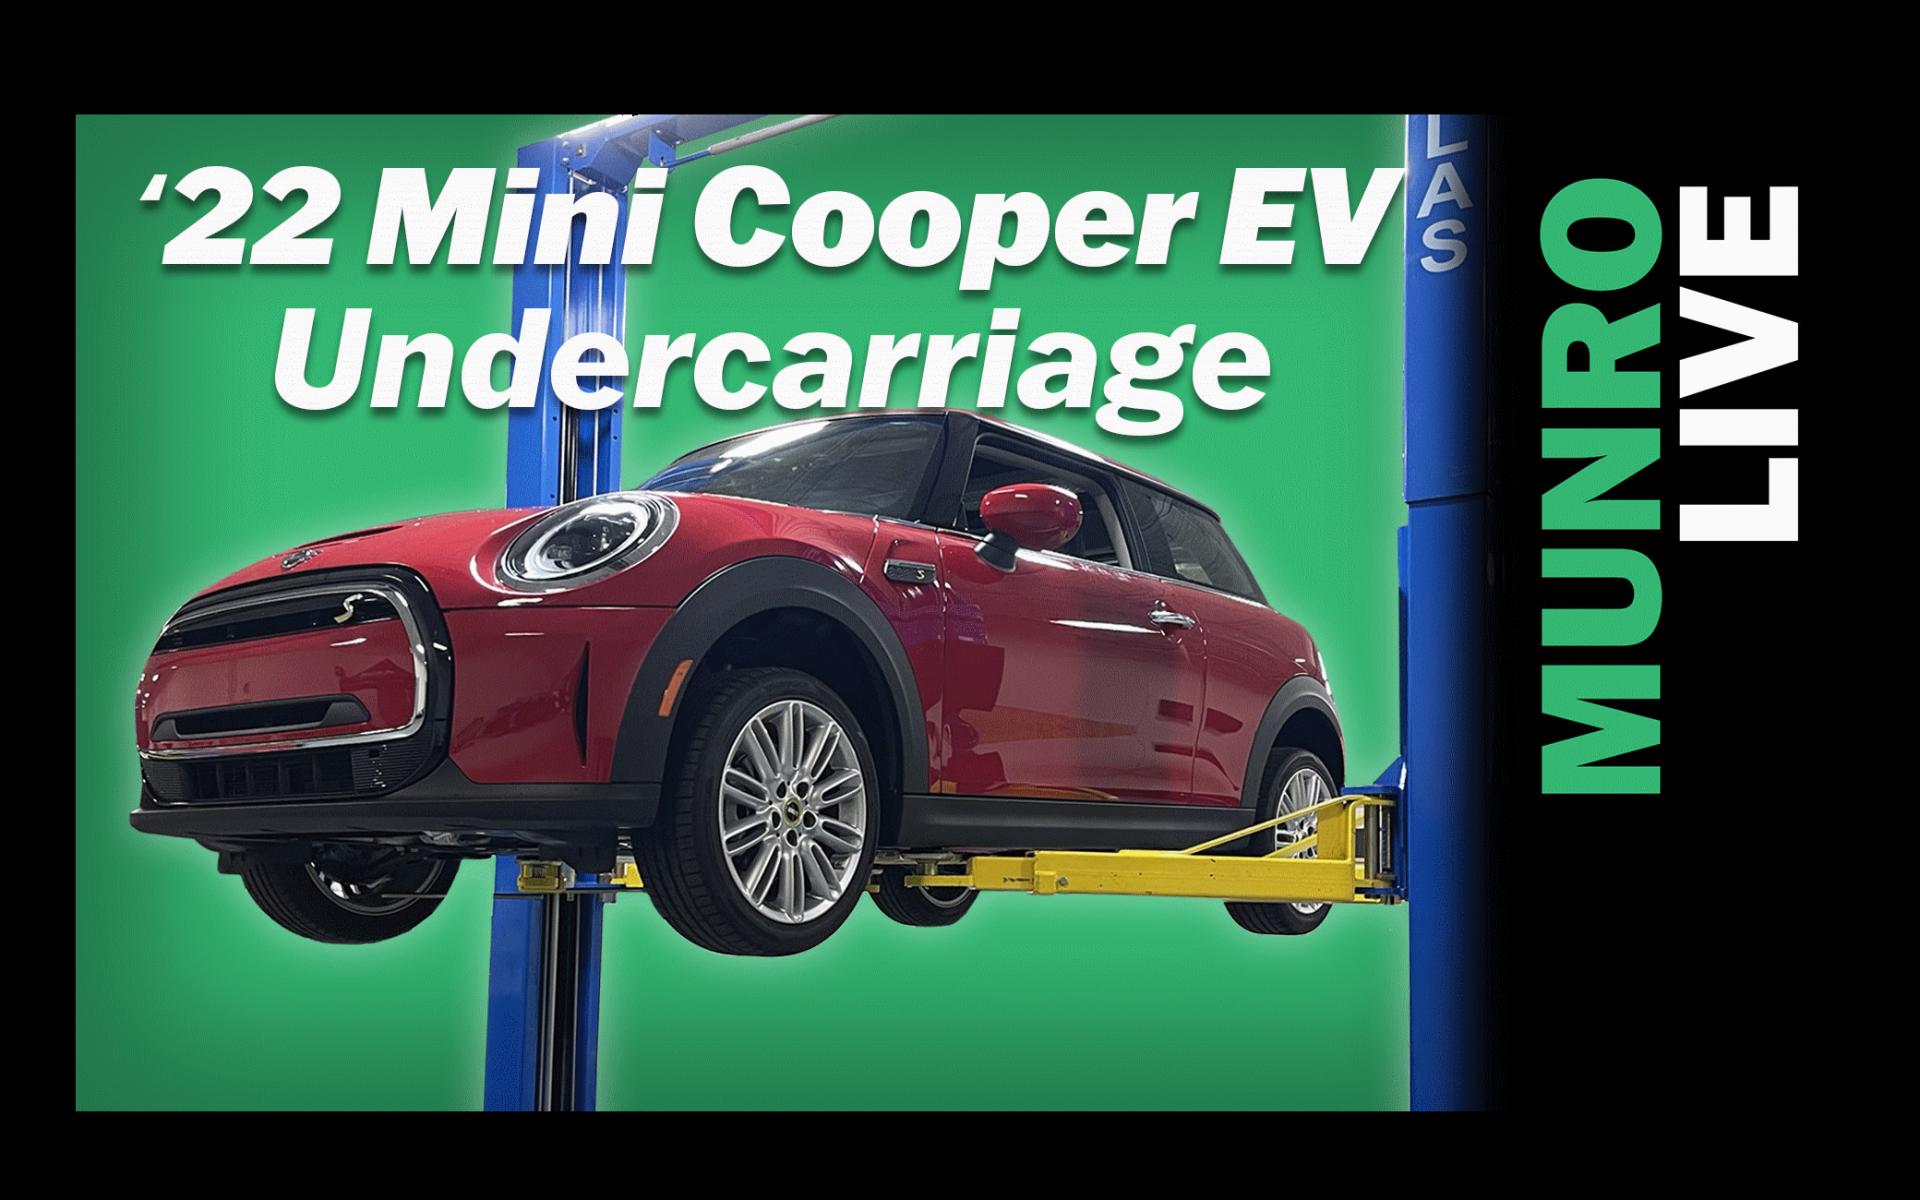 Munro Analyzes the 2022 Mini Cooper SE EV Undercarriage